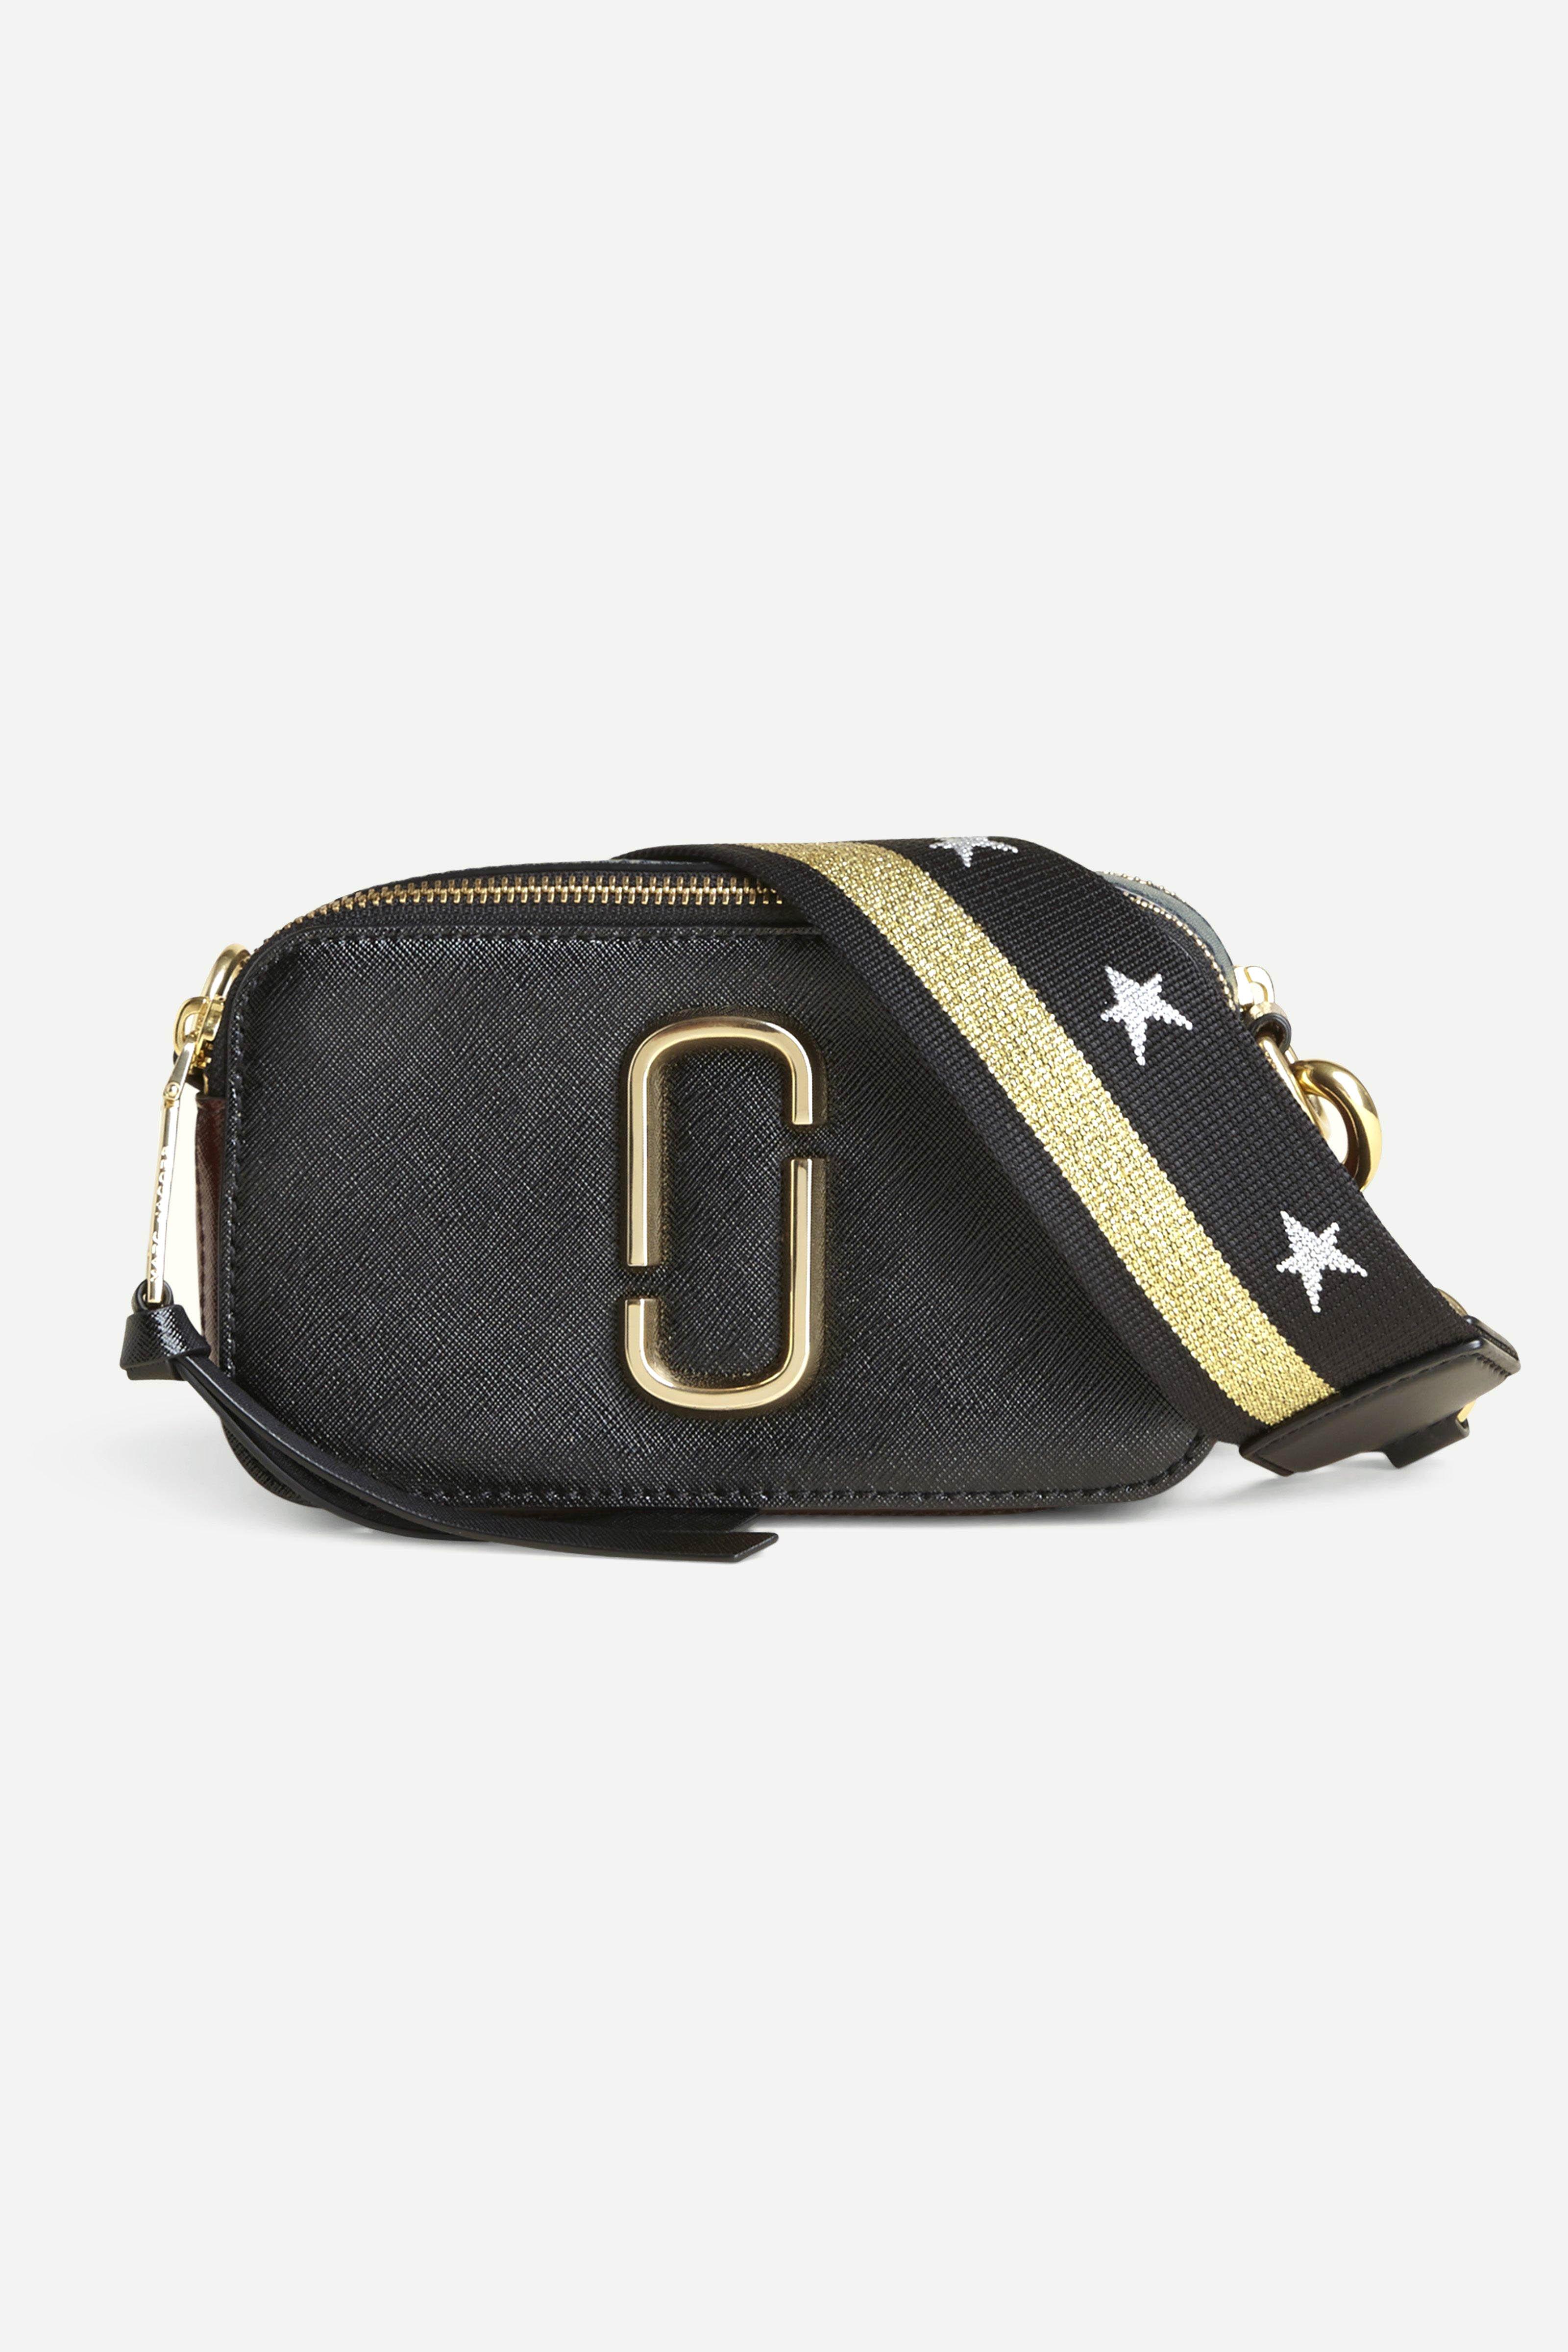 Marc Jacobs 4 - Snapshot Camera Bag - Black